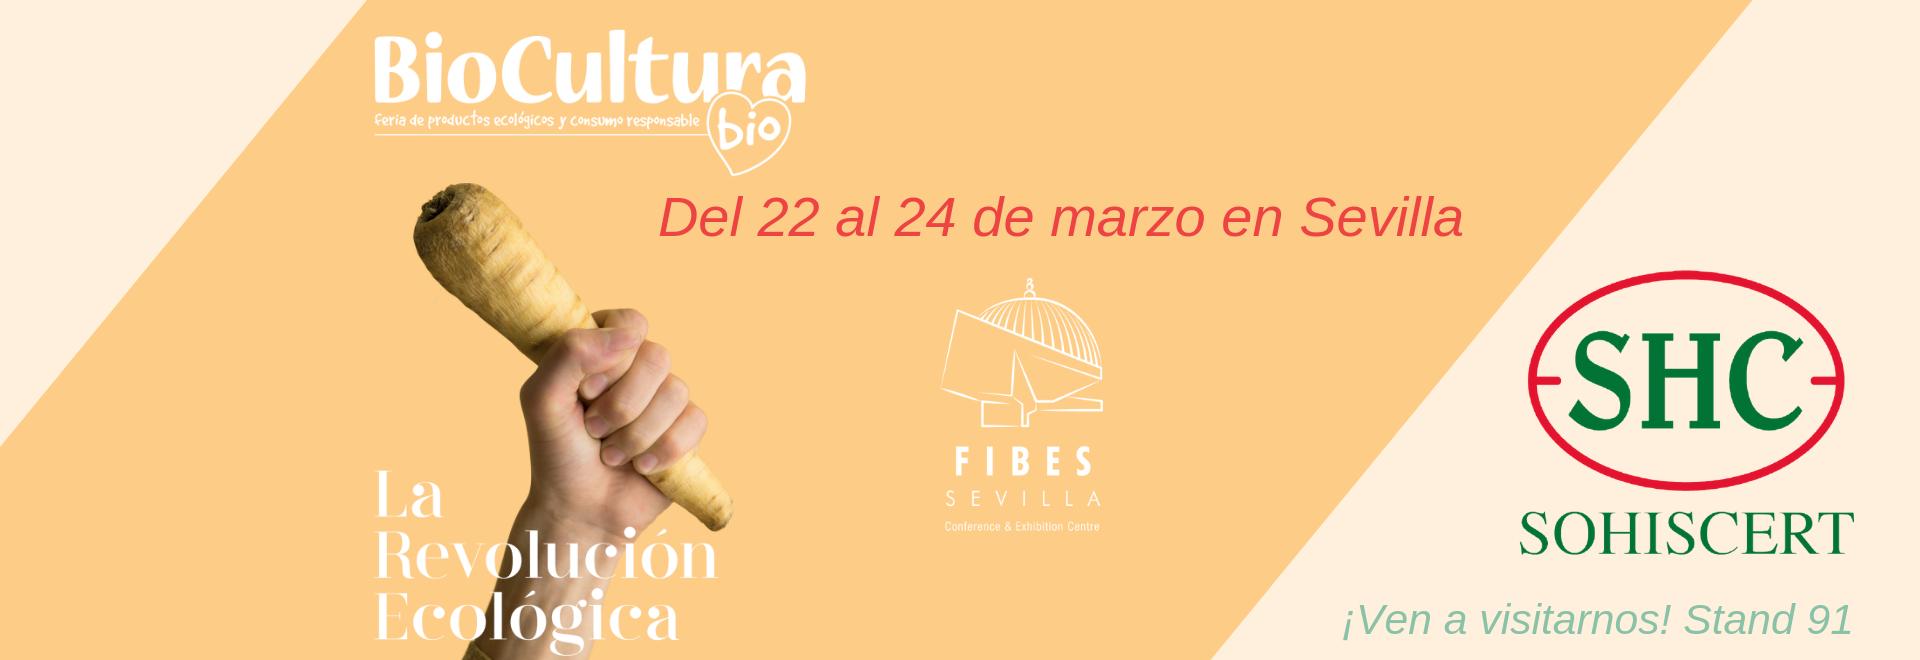 Biocultura Sevilla